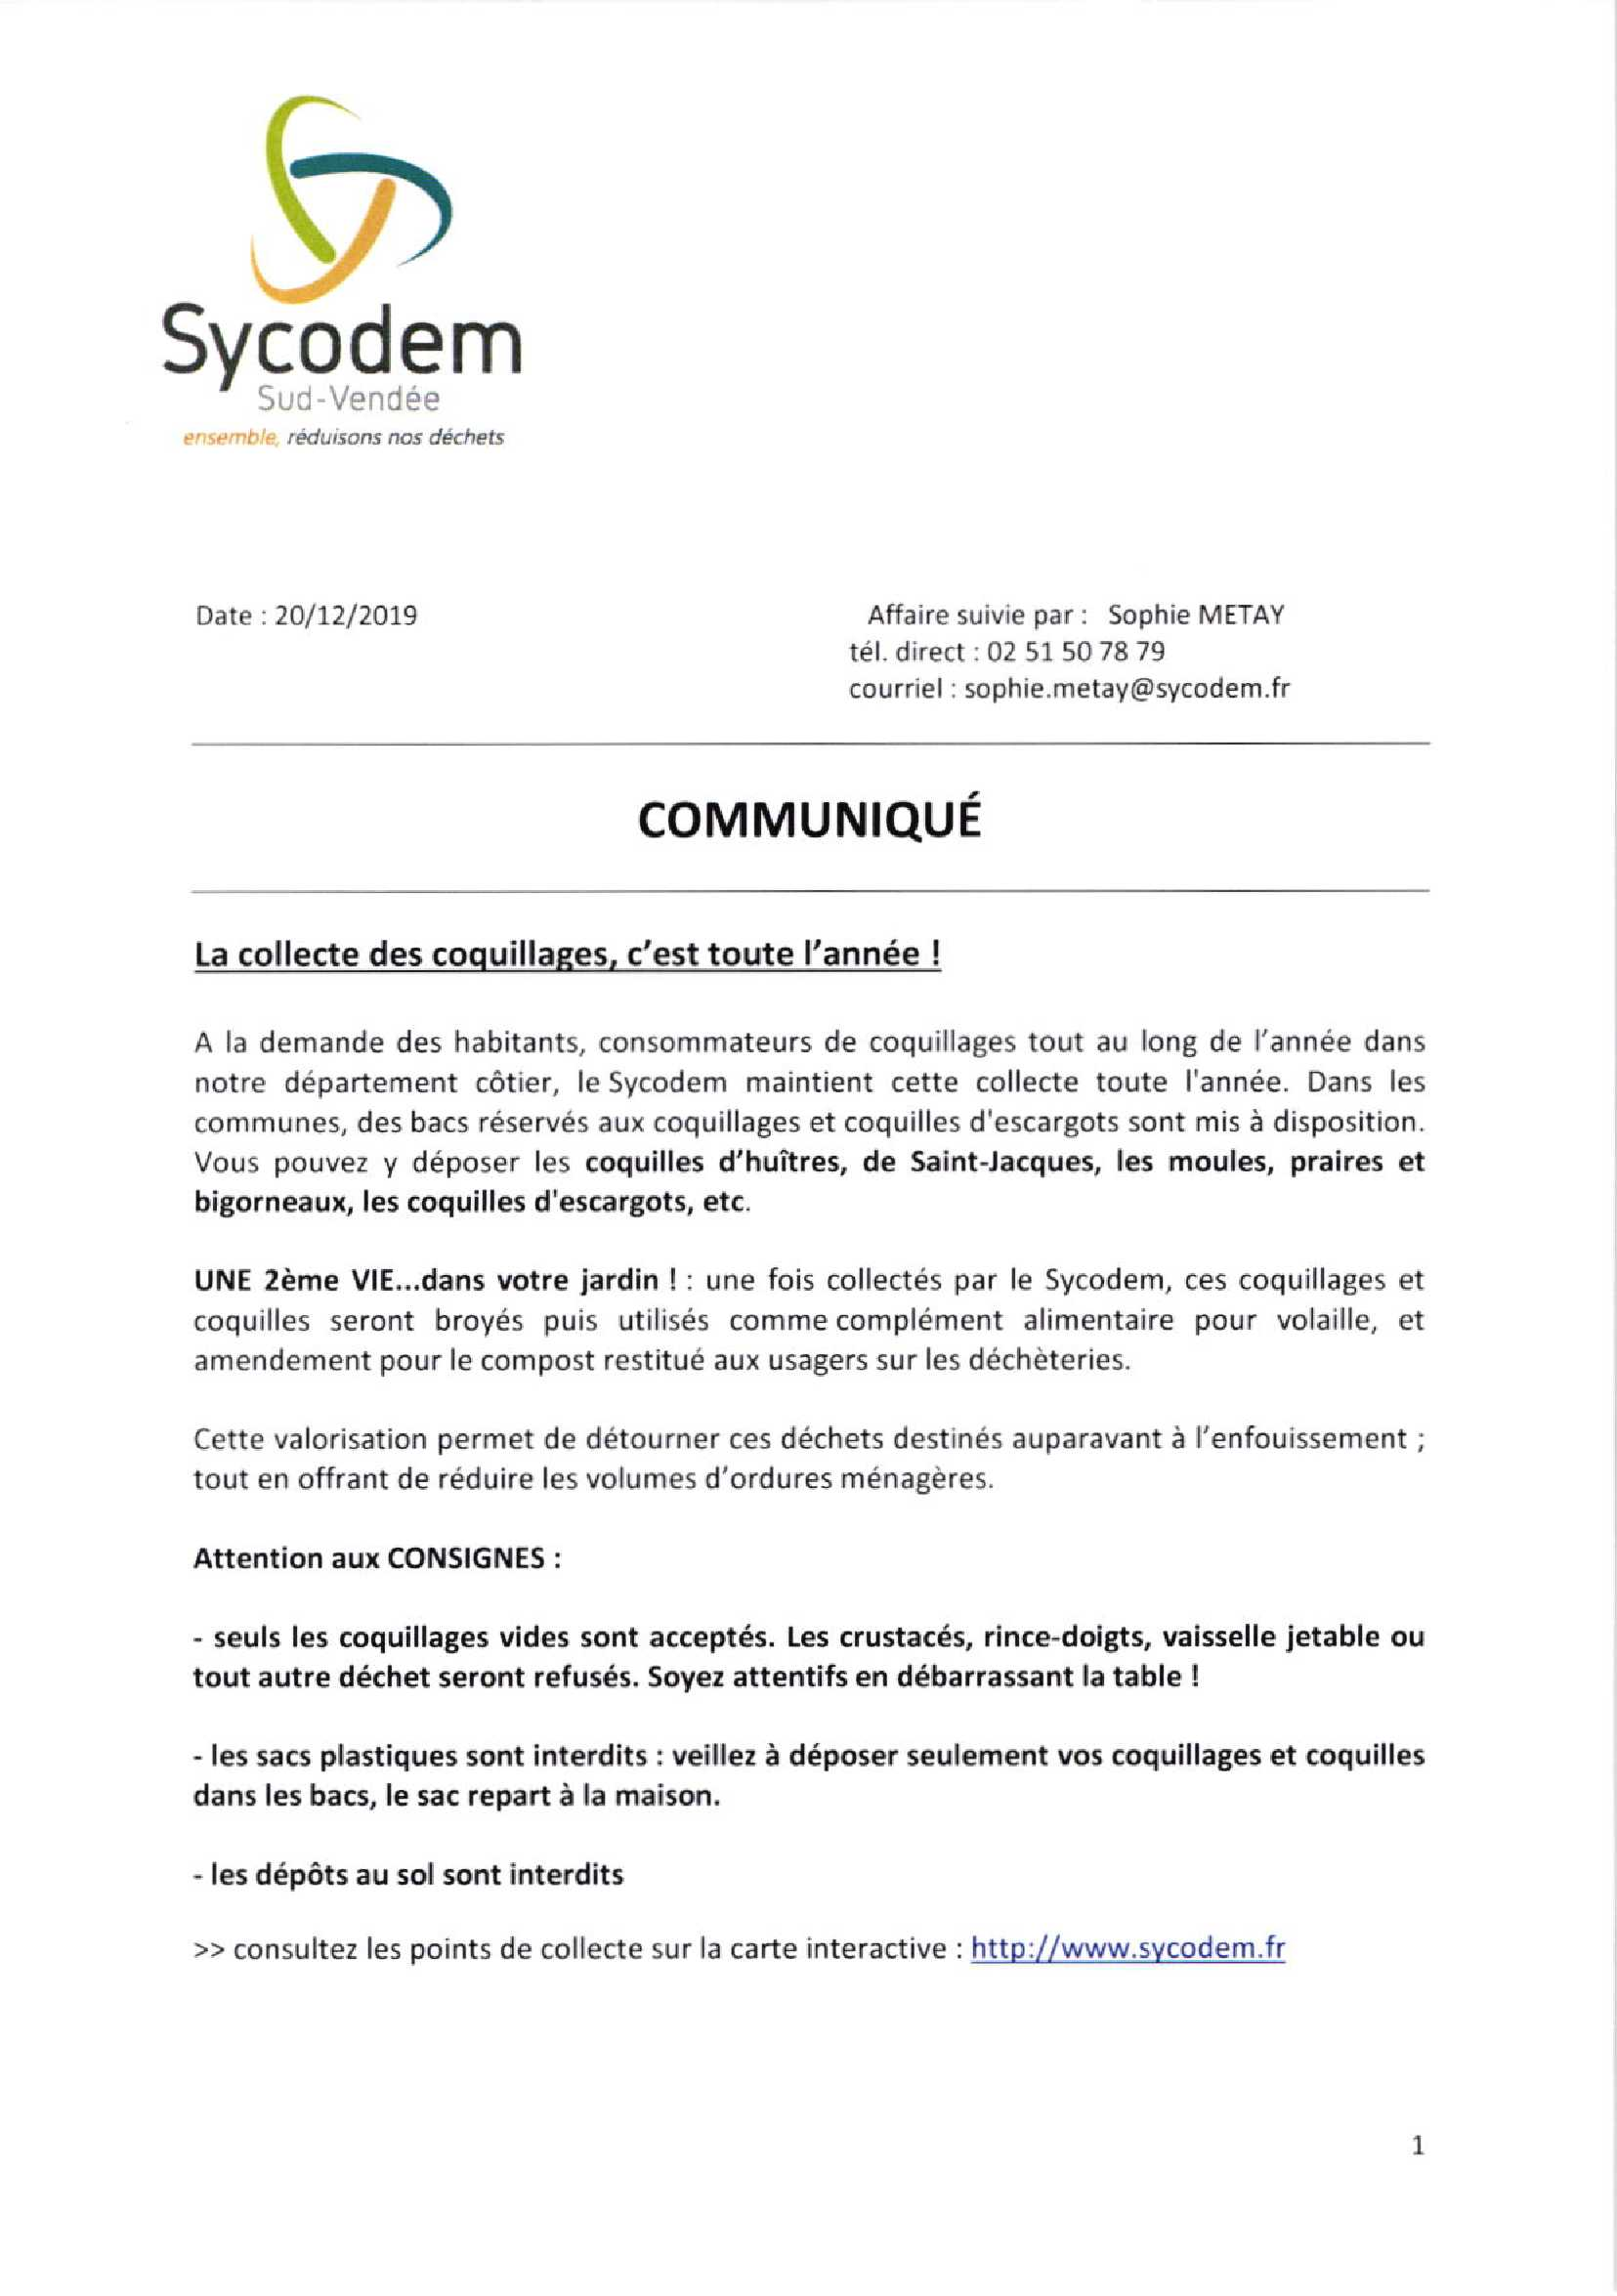 communiqué Sycodem 2